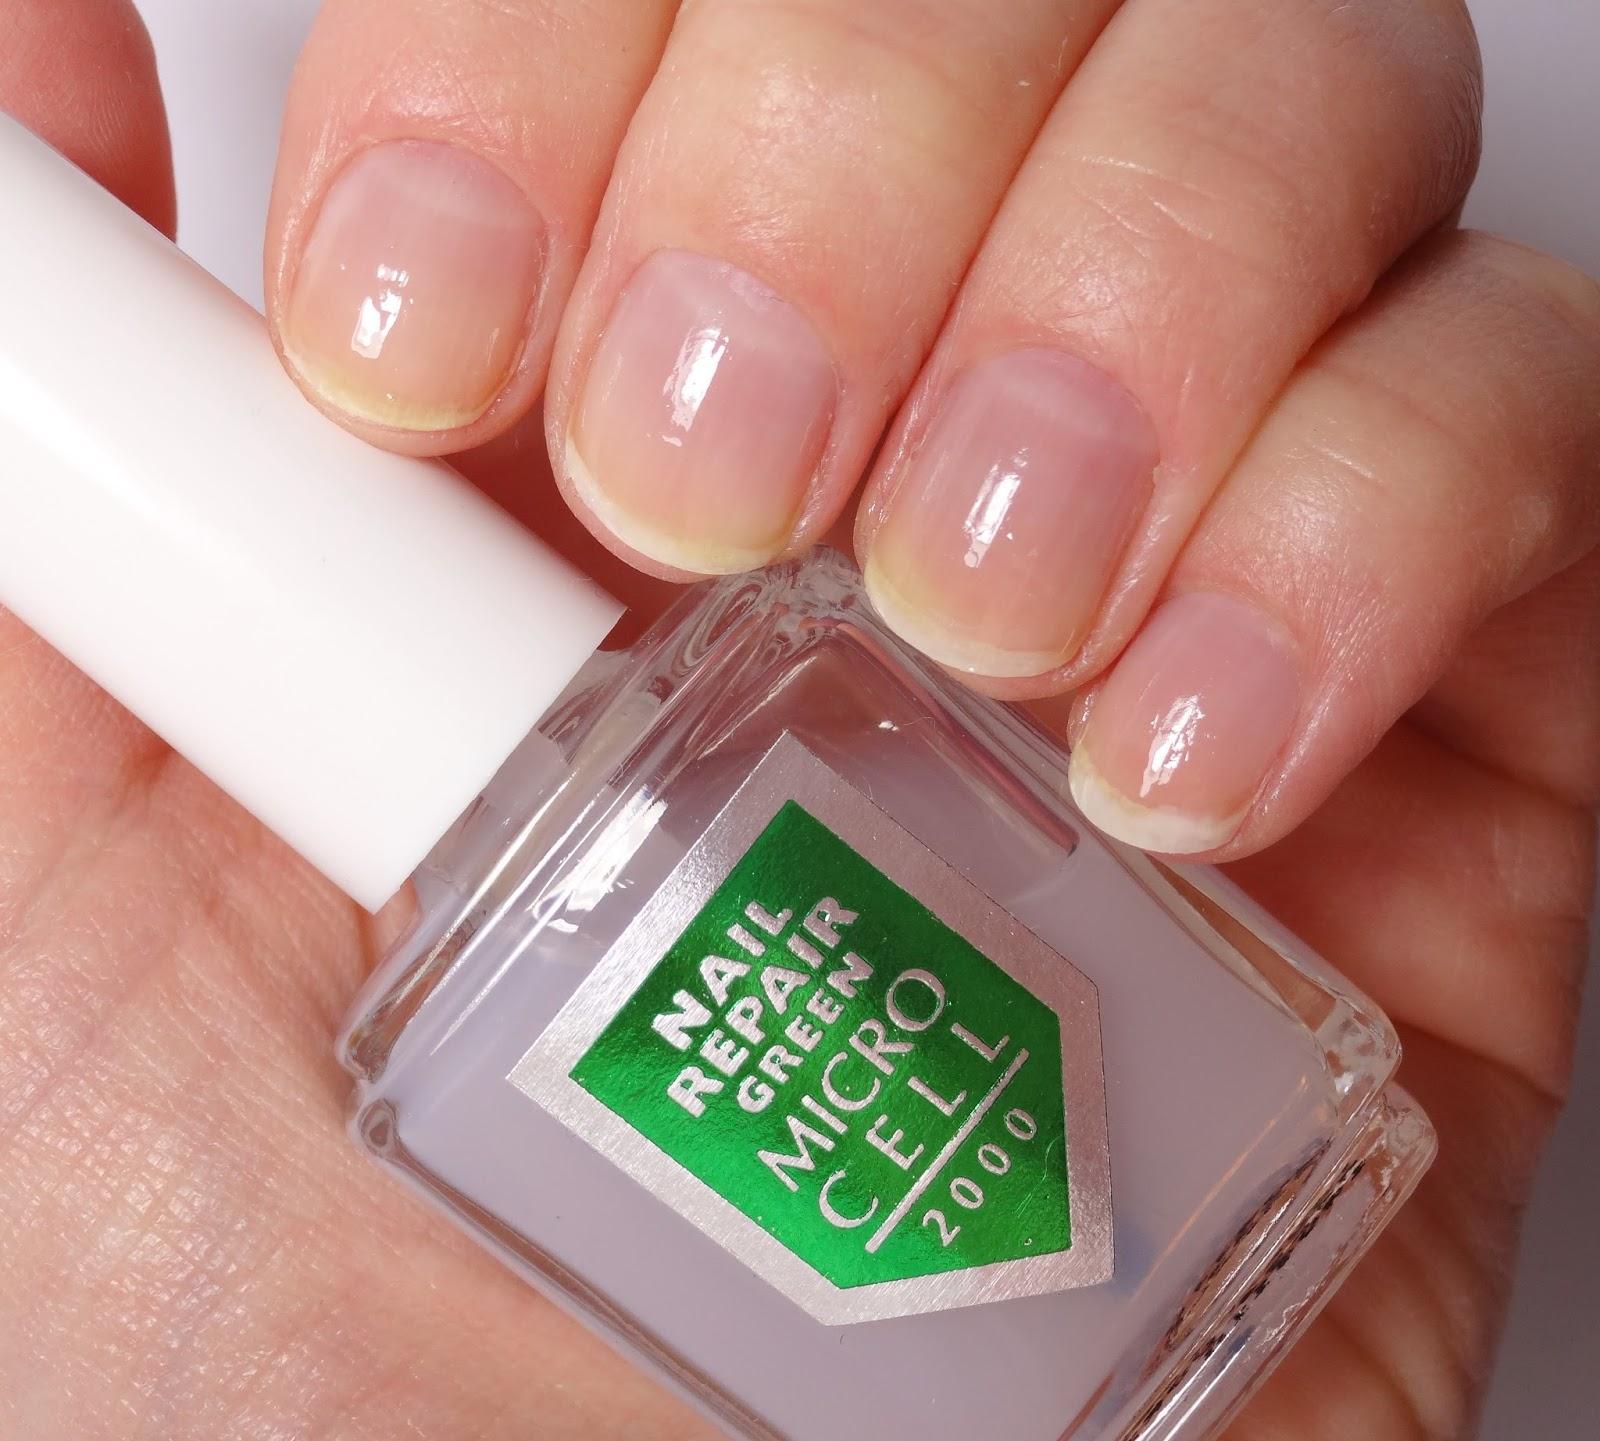 Micro Cell 2000 - Nail Repair GREEN Pretty Clover Beautyblog